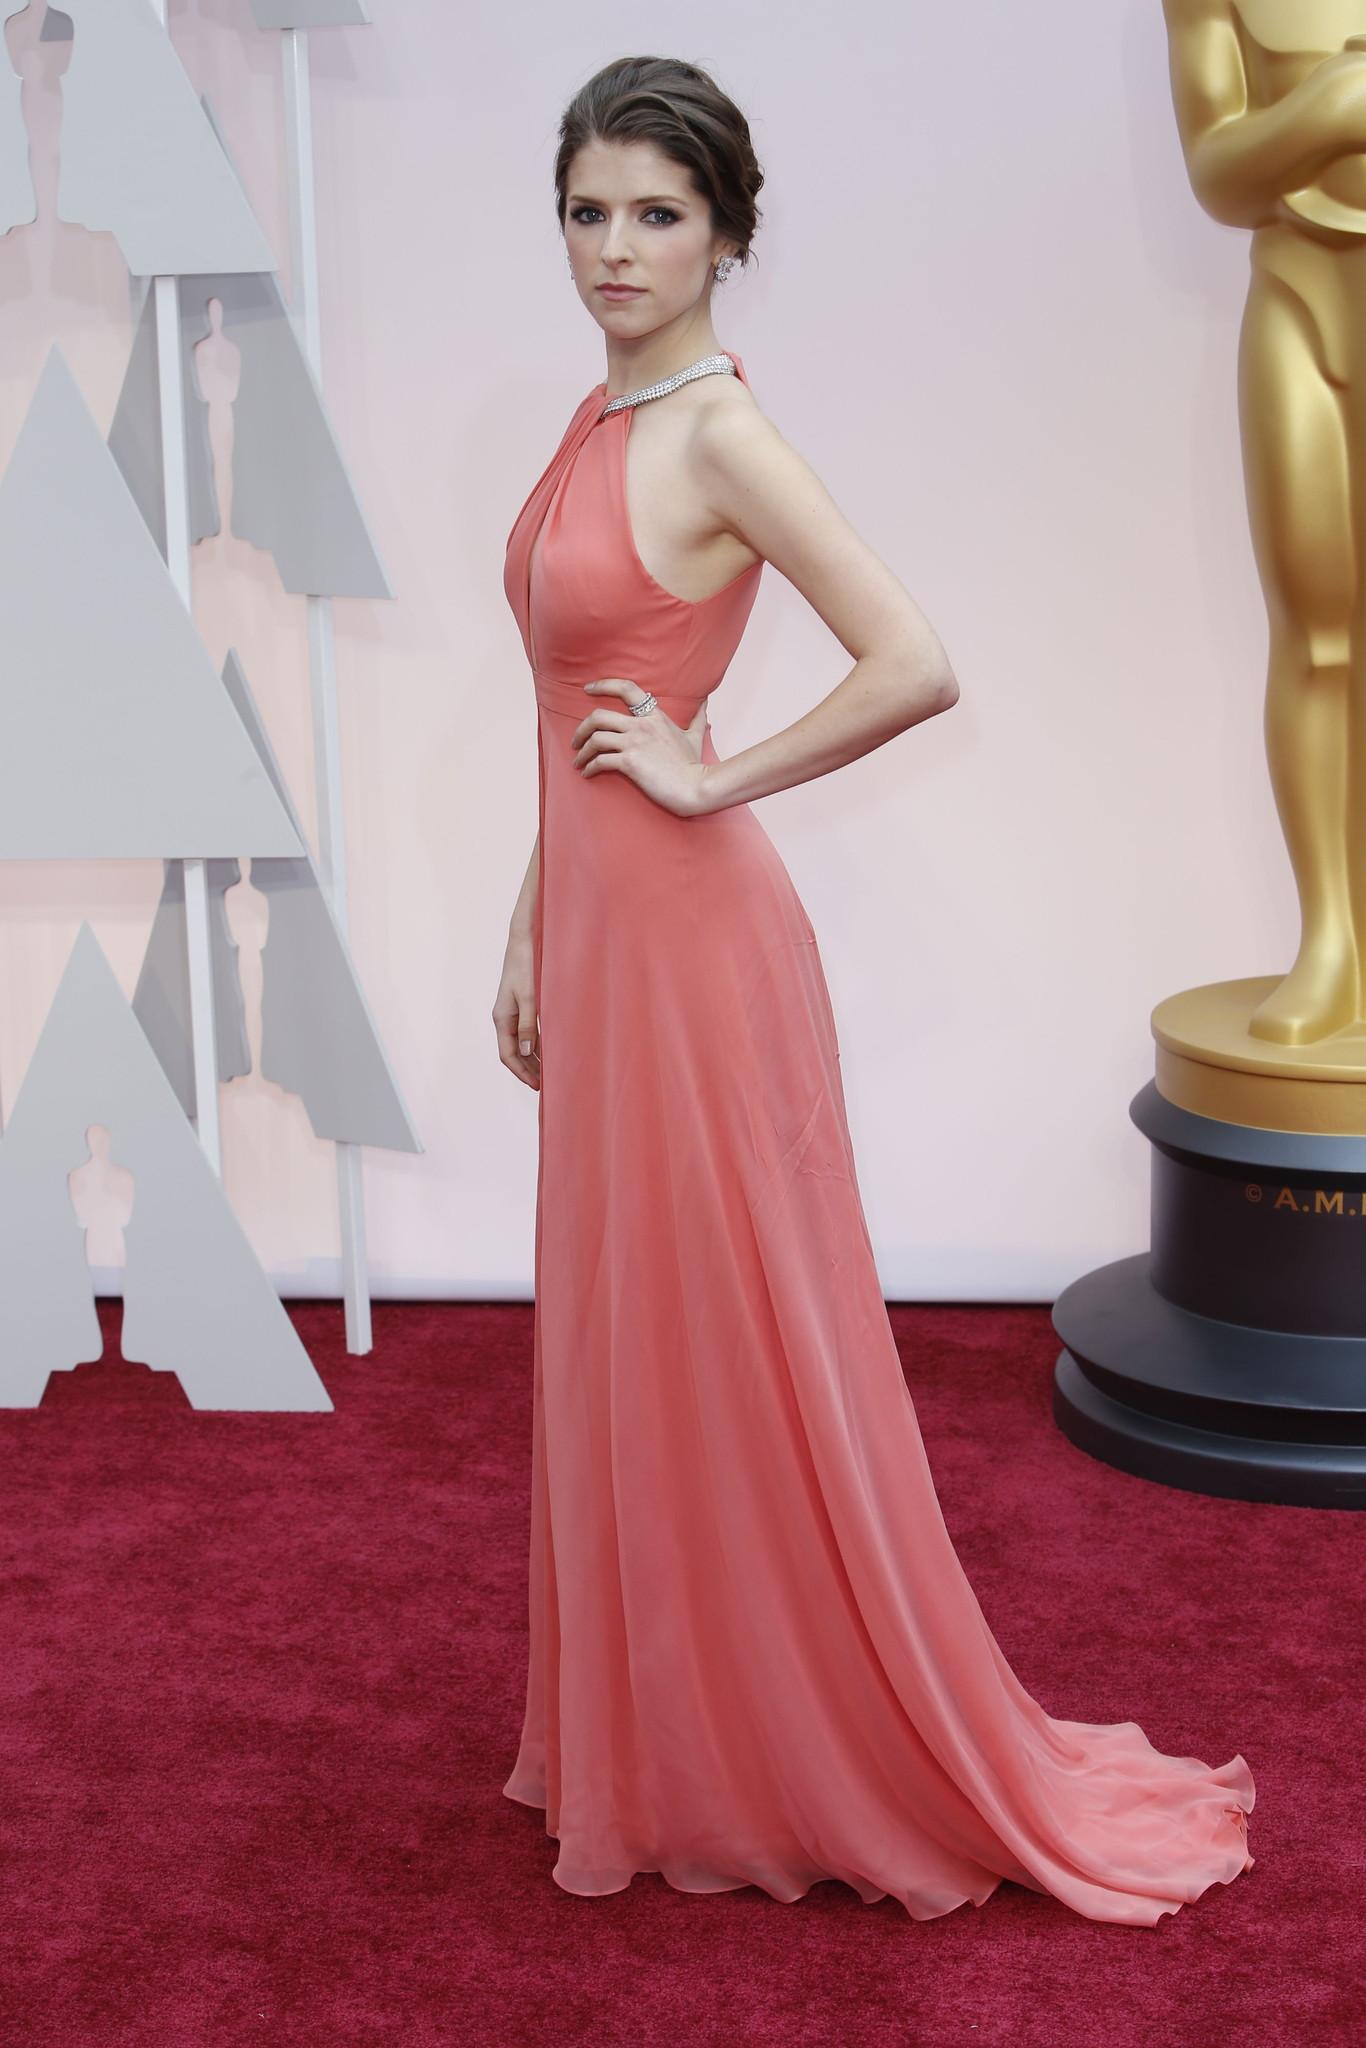 Vistoso Vestido De Novia De Hillary Clinton Ornamento - Colección de ...